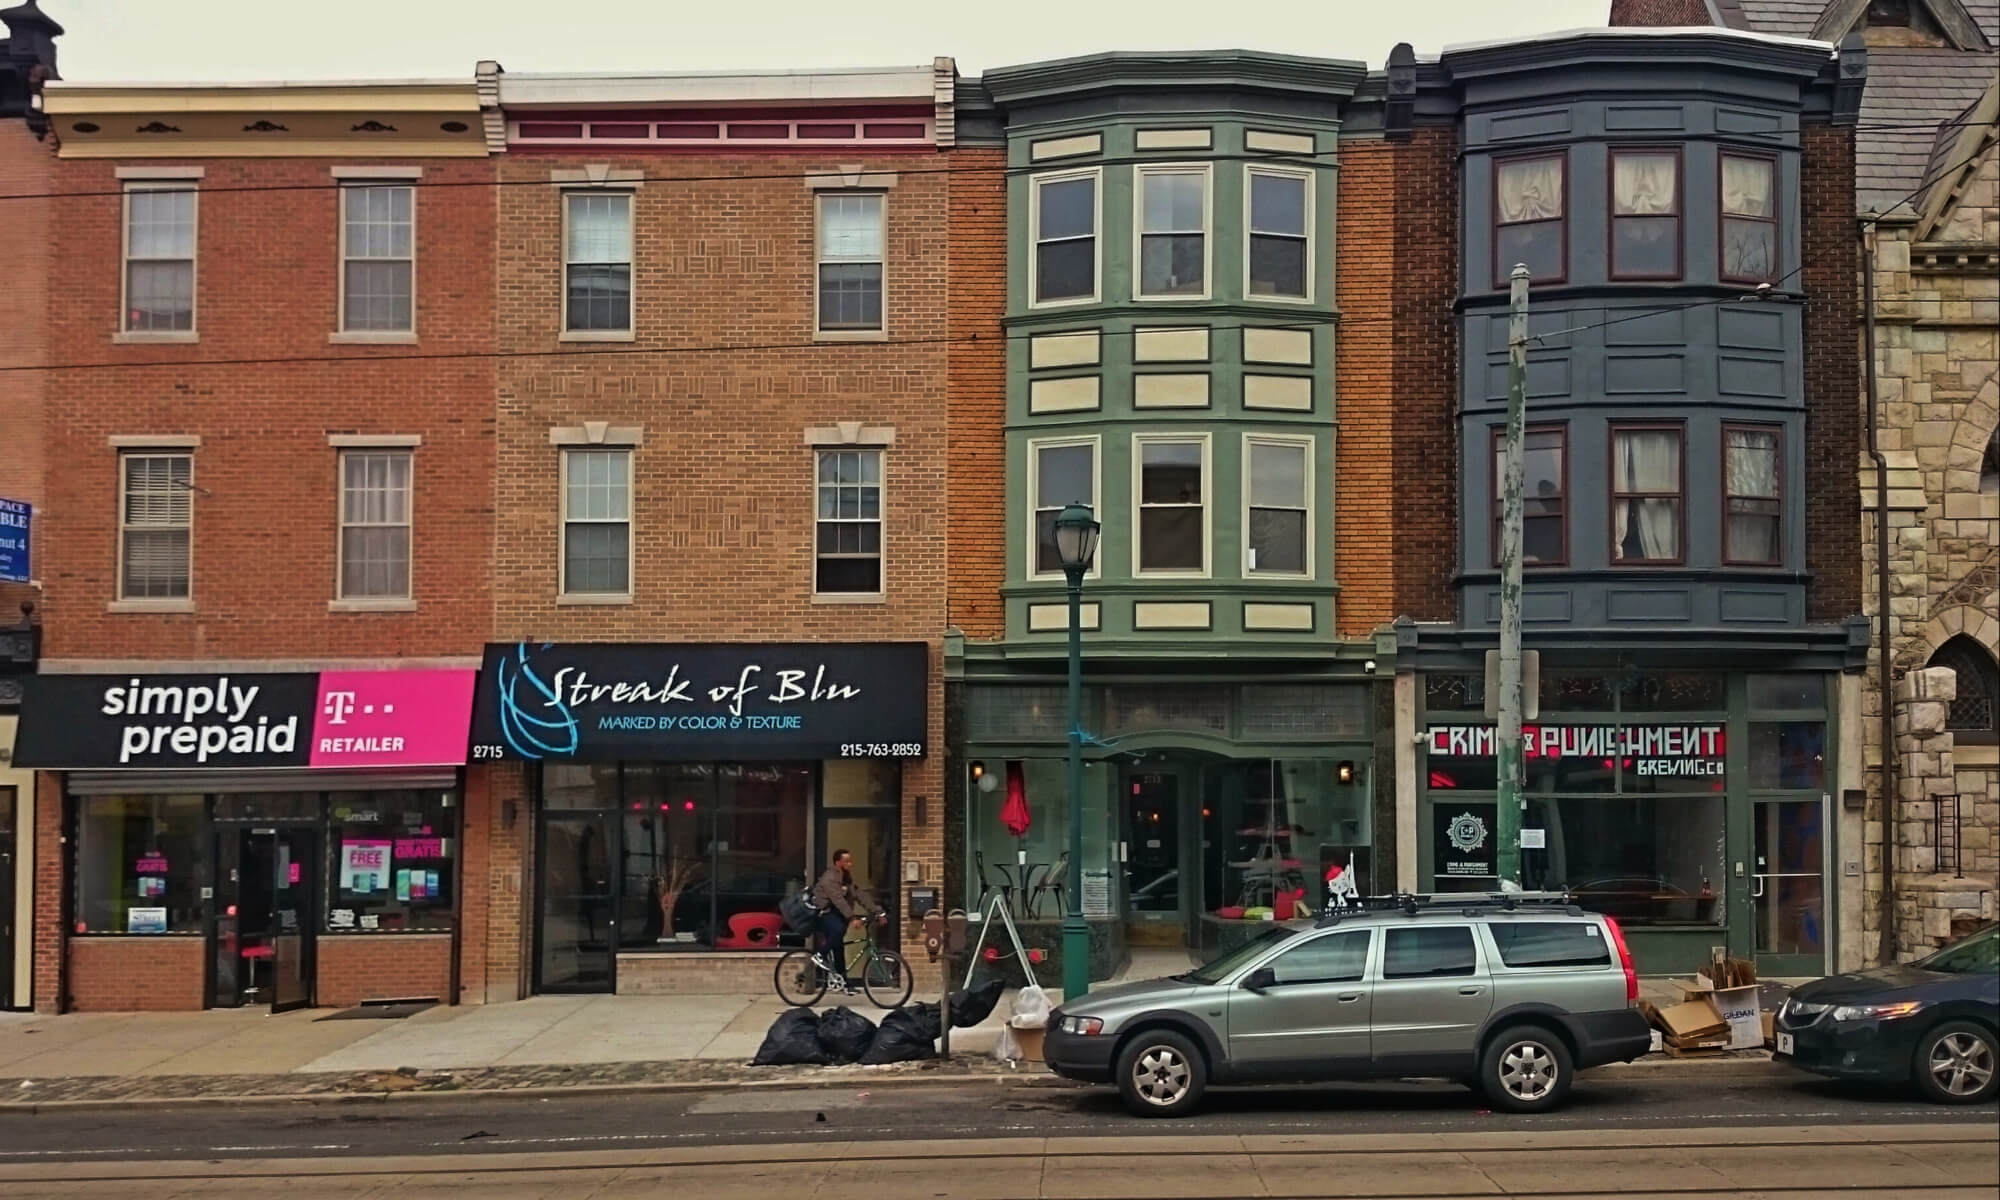 Line of stores in Brewerytown, Philadelphia